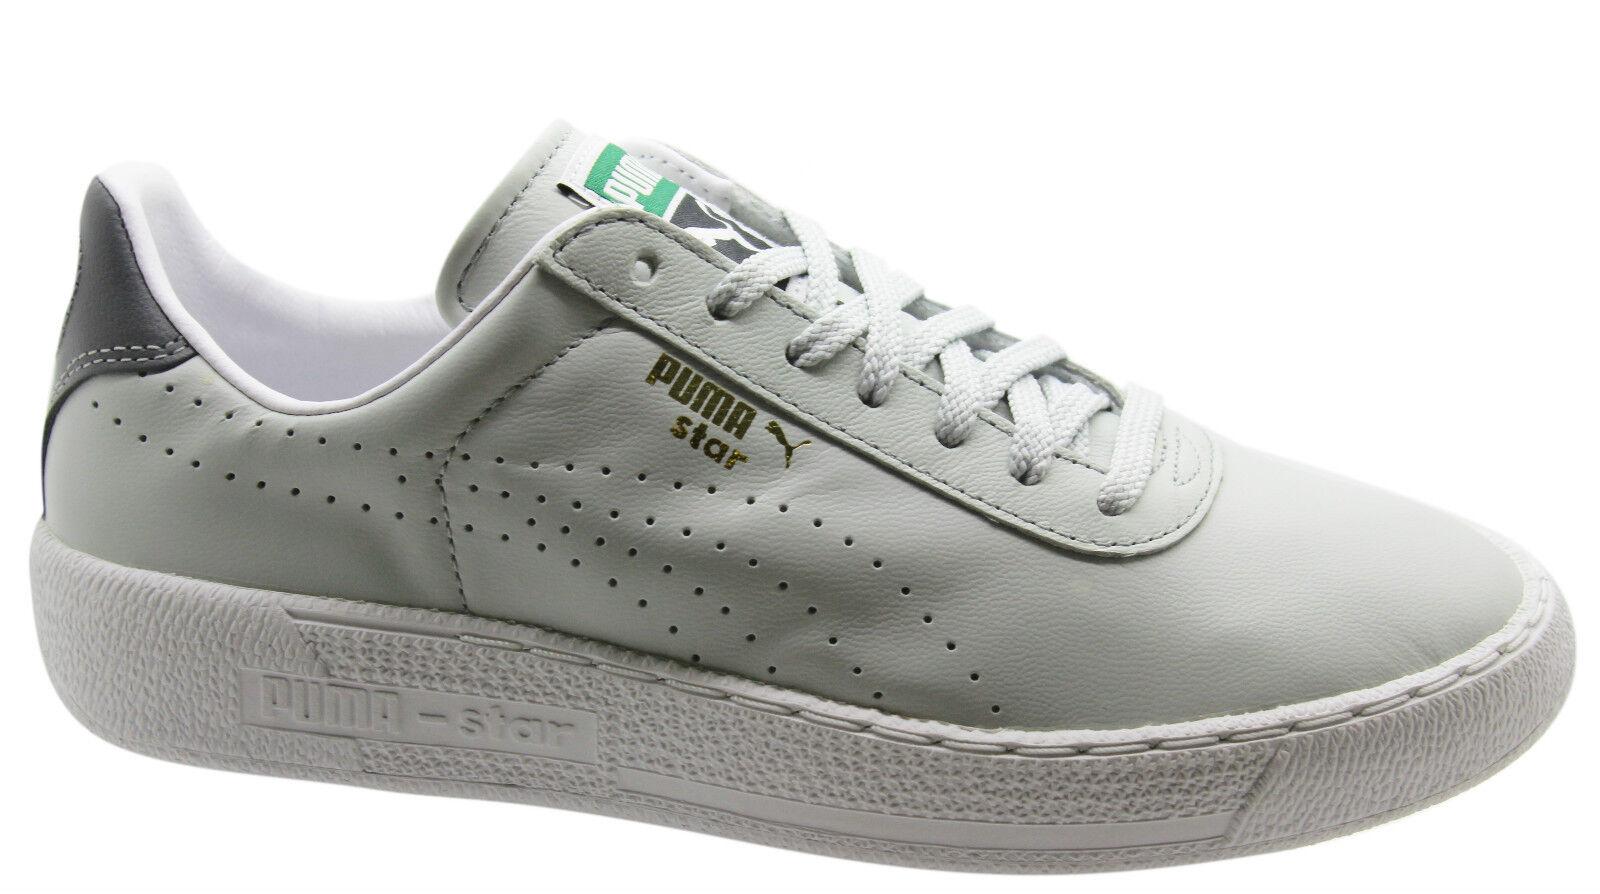 Puma Star Männer Turnzapatos hellgris Leder Unisex NIEDRIGE zapatos 359276 10 D79